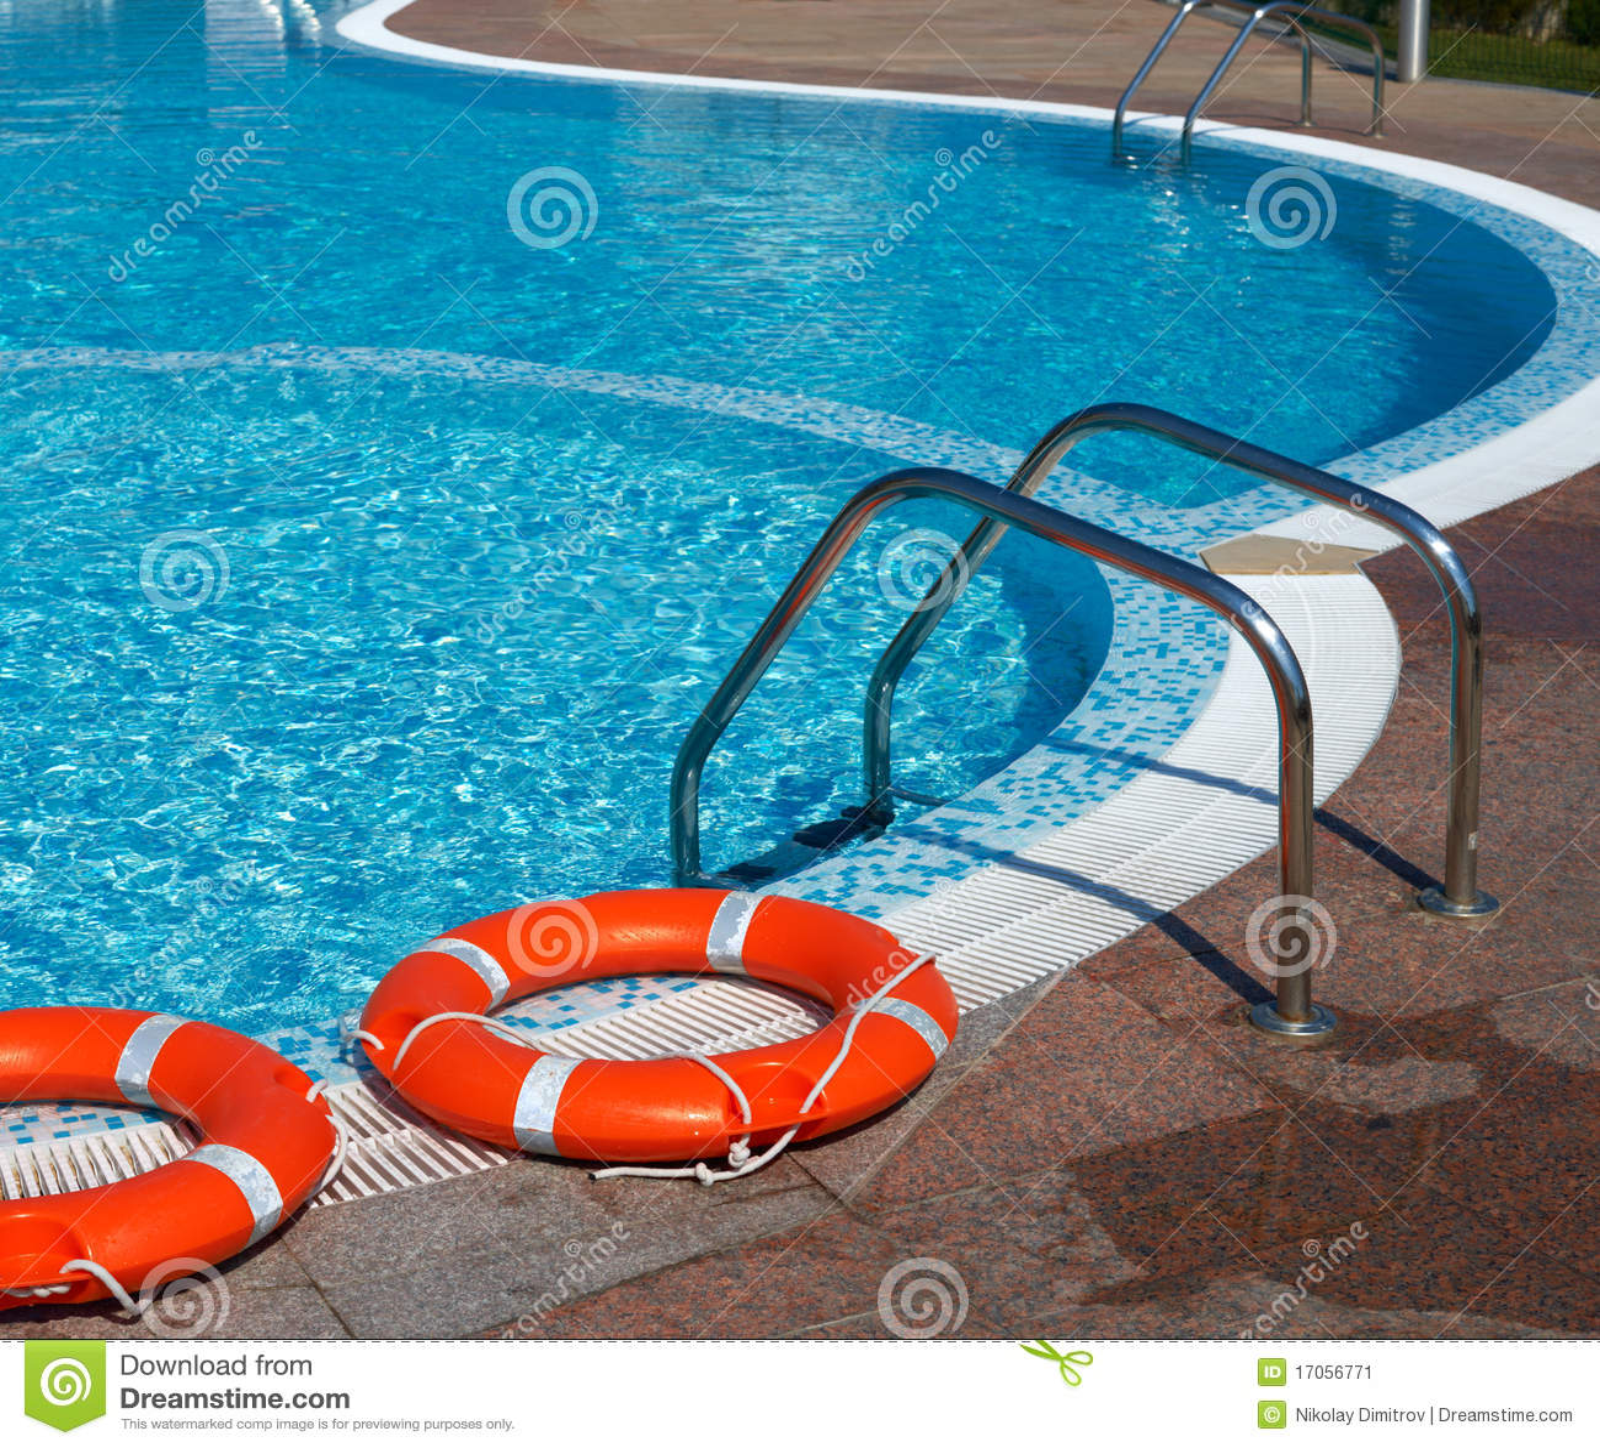 flotadores y piscina imagen de archivo imagen 17056771 On flotadores piscina